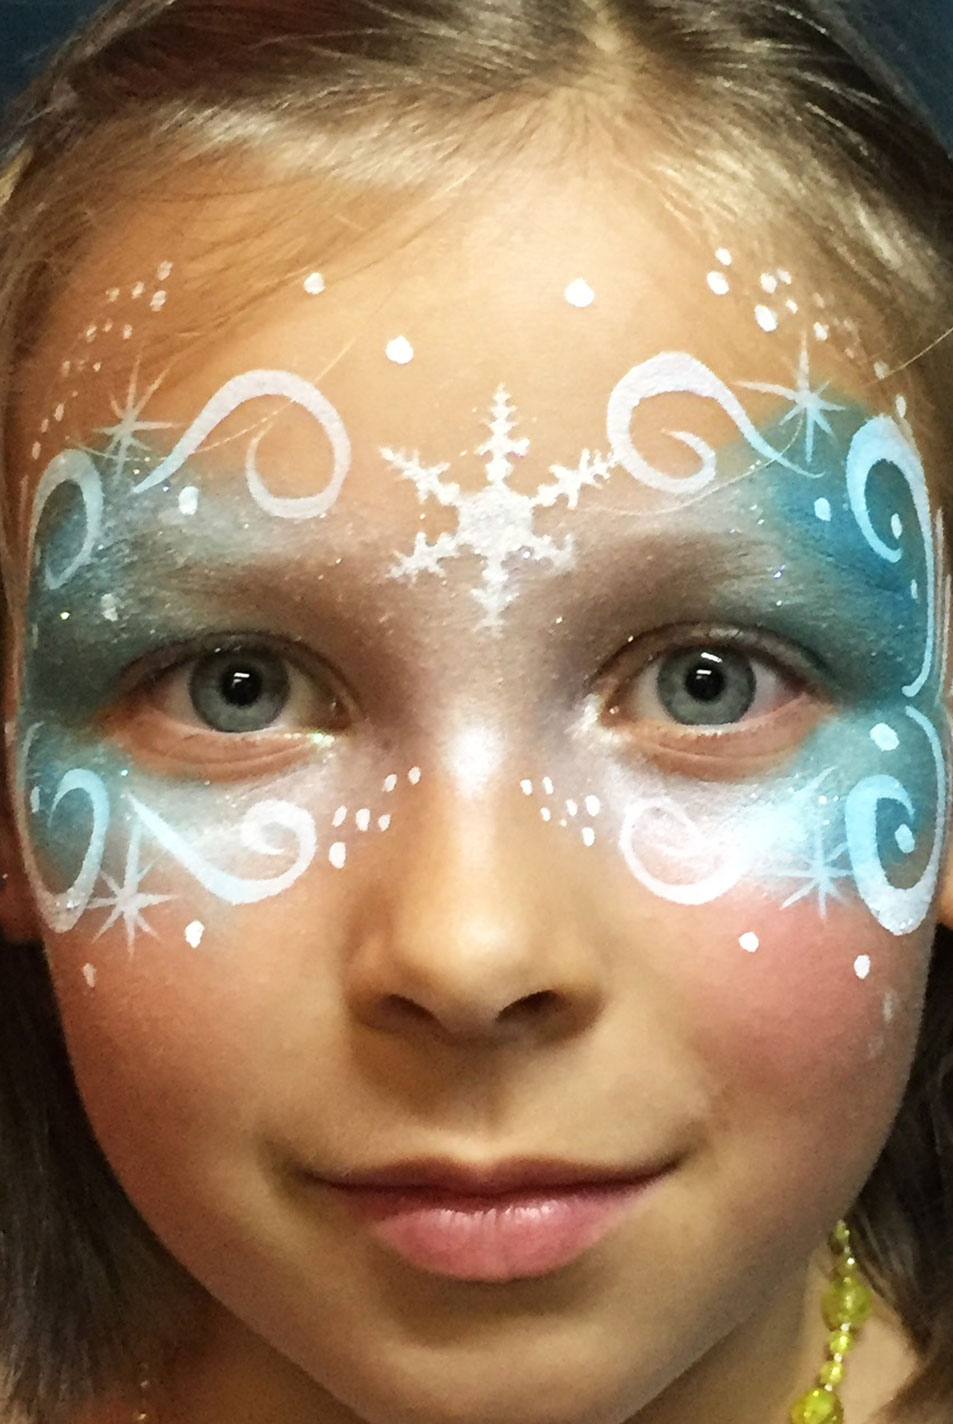 Maquillage fille professionnel reine des neiges